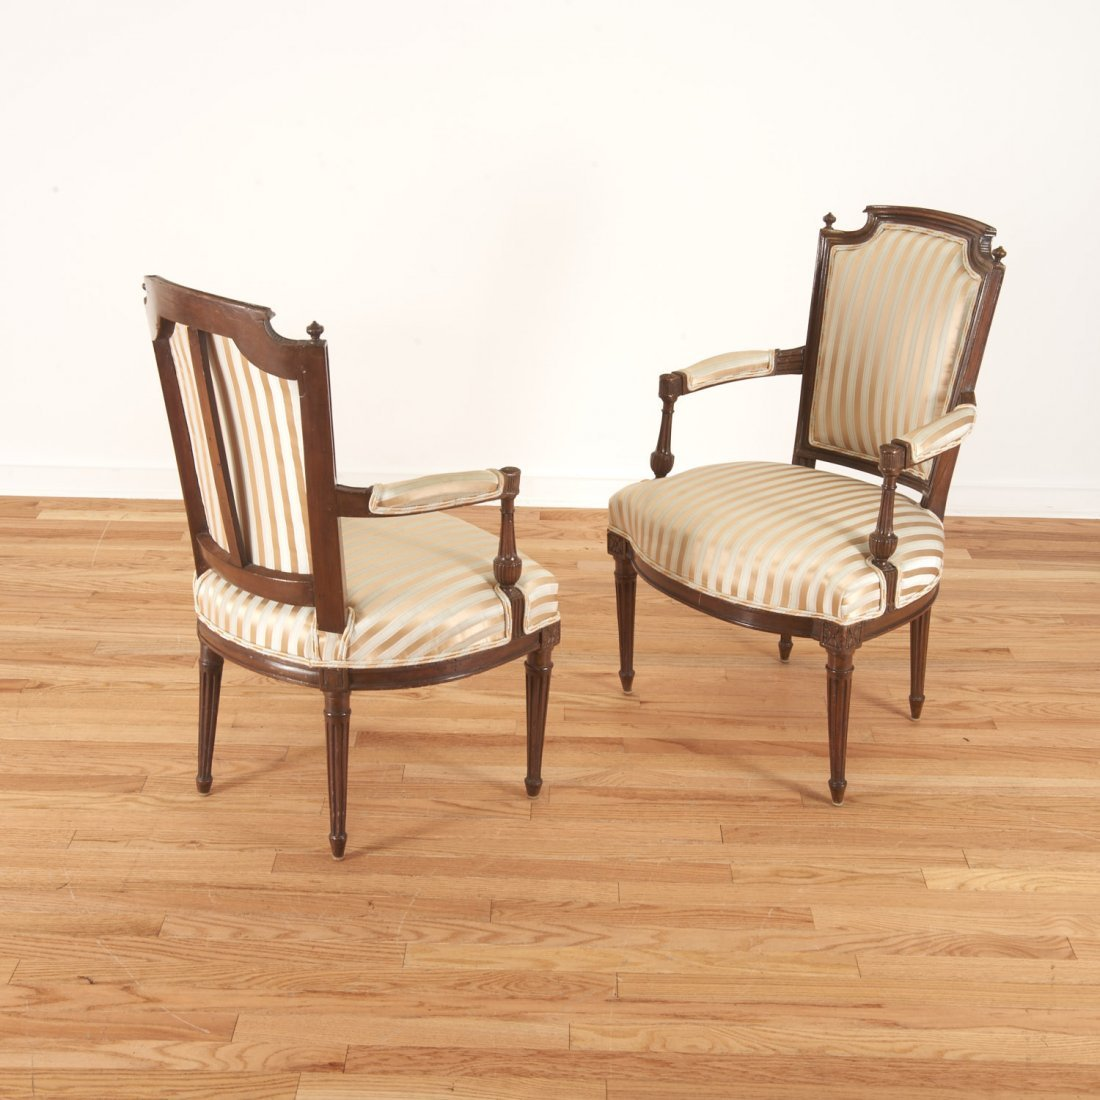 Pr Directoire silk upholstered mahogany fauteuils - 2